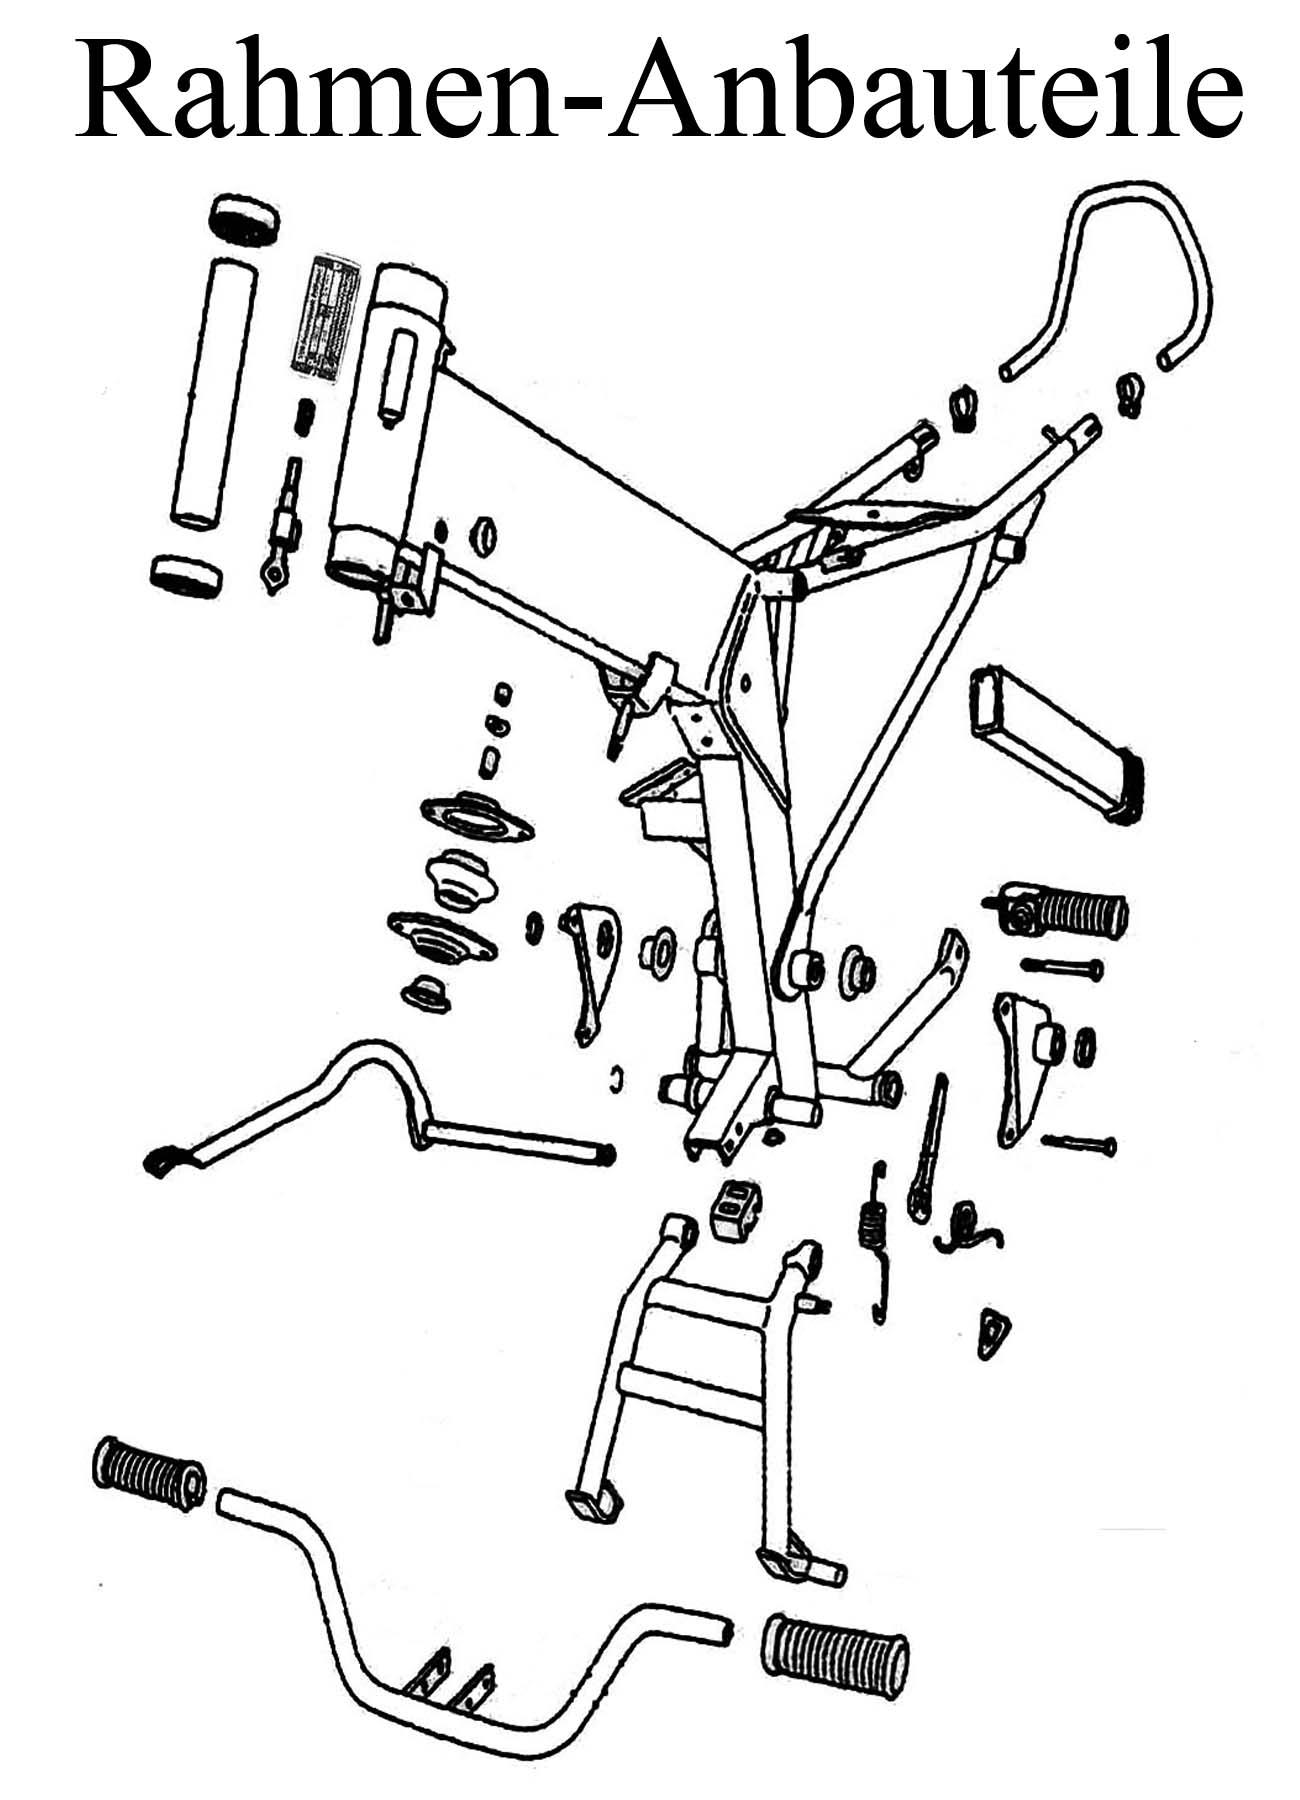 MZ ETZ 250 Ersatzteile Rahmen Anbauteile Fahrgestell